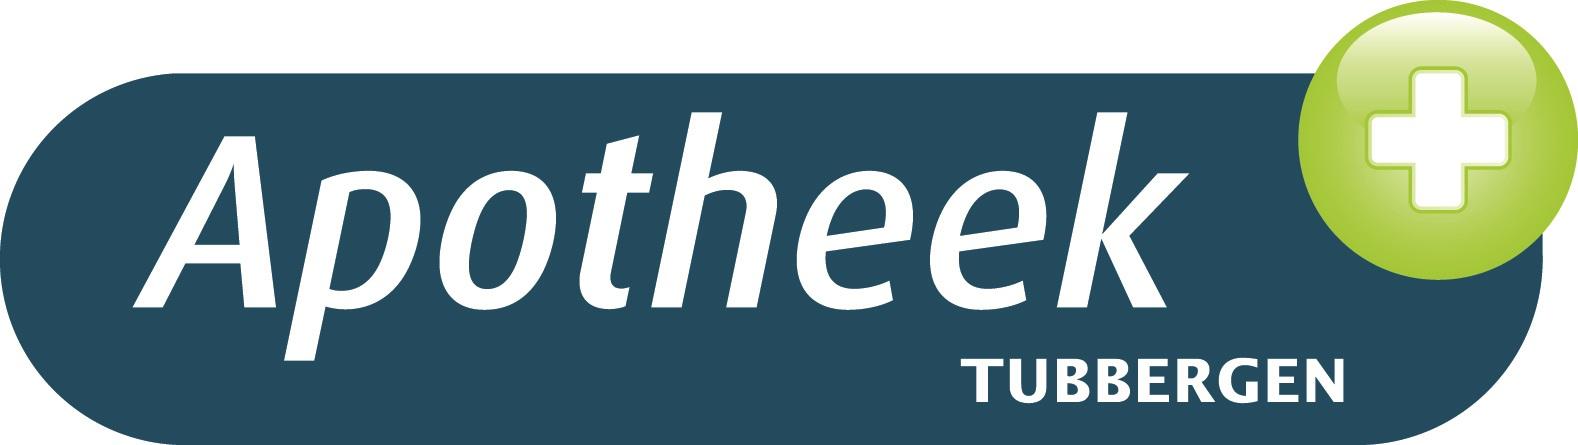 Startpagina Apotheek Tubbergen